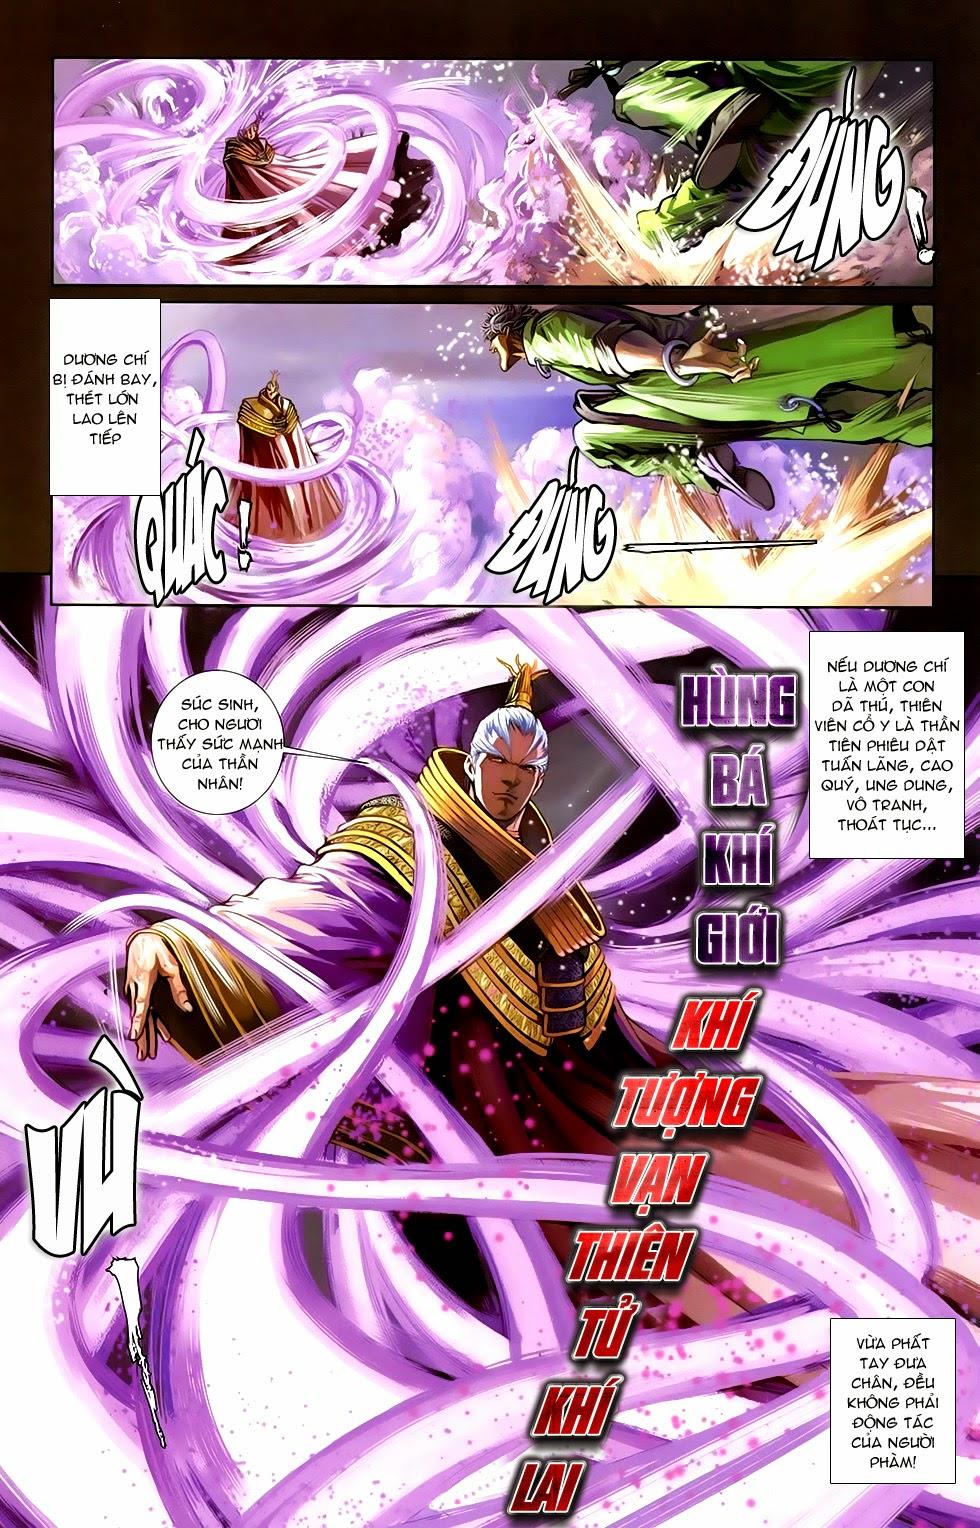 108 - Tân Thuỷ Hử  Chap 017 - Truyenmoi.xyz